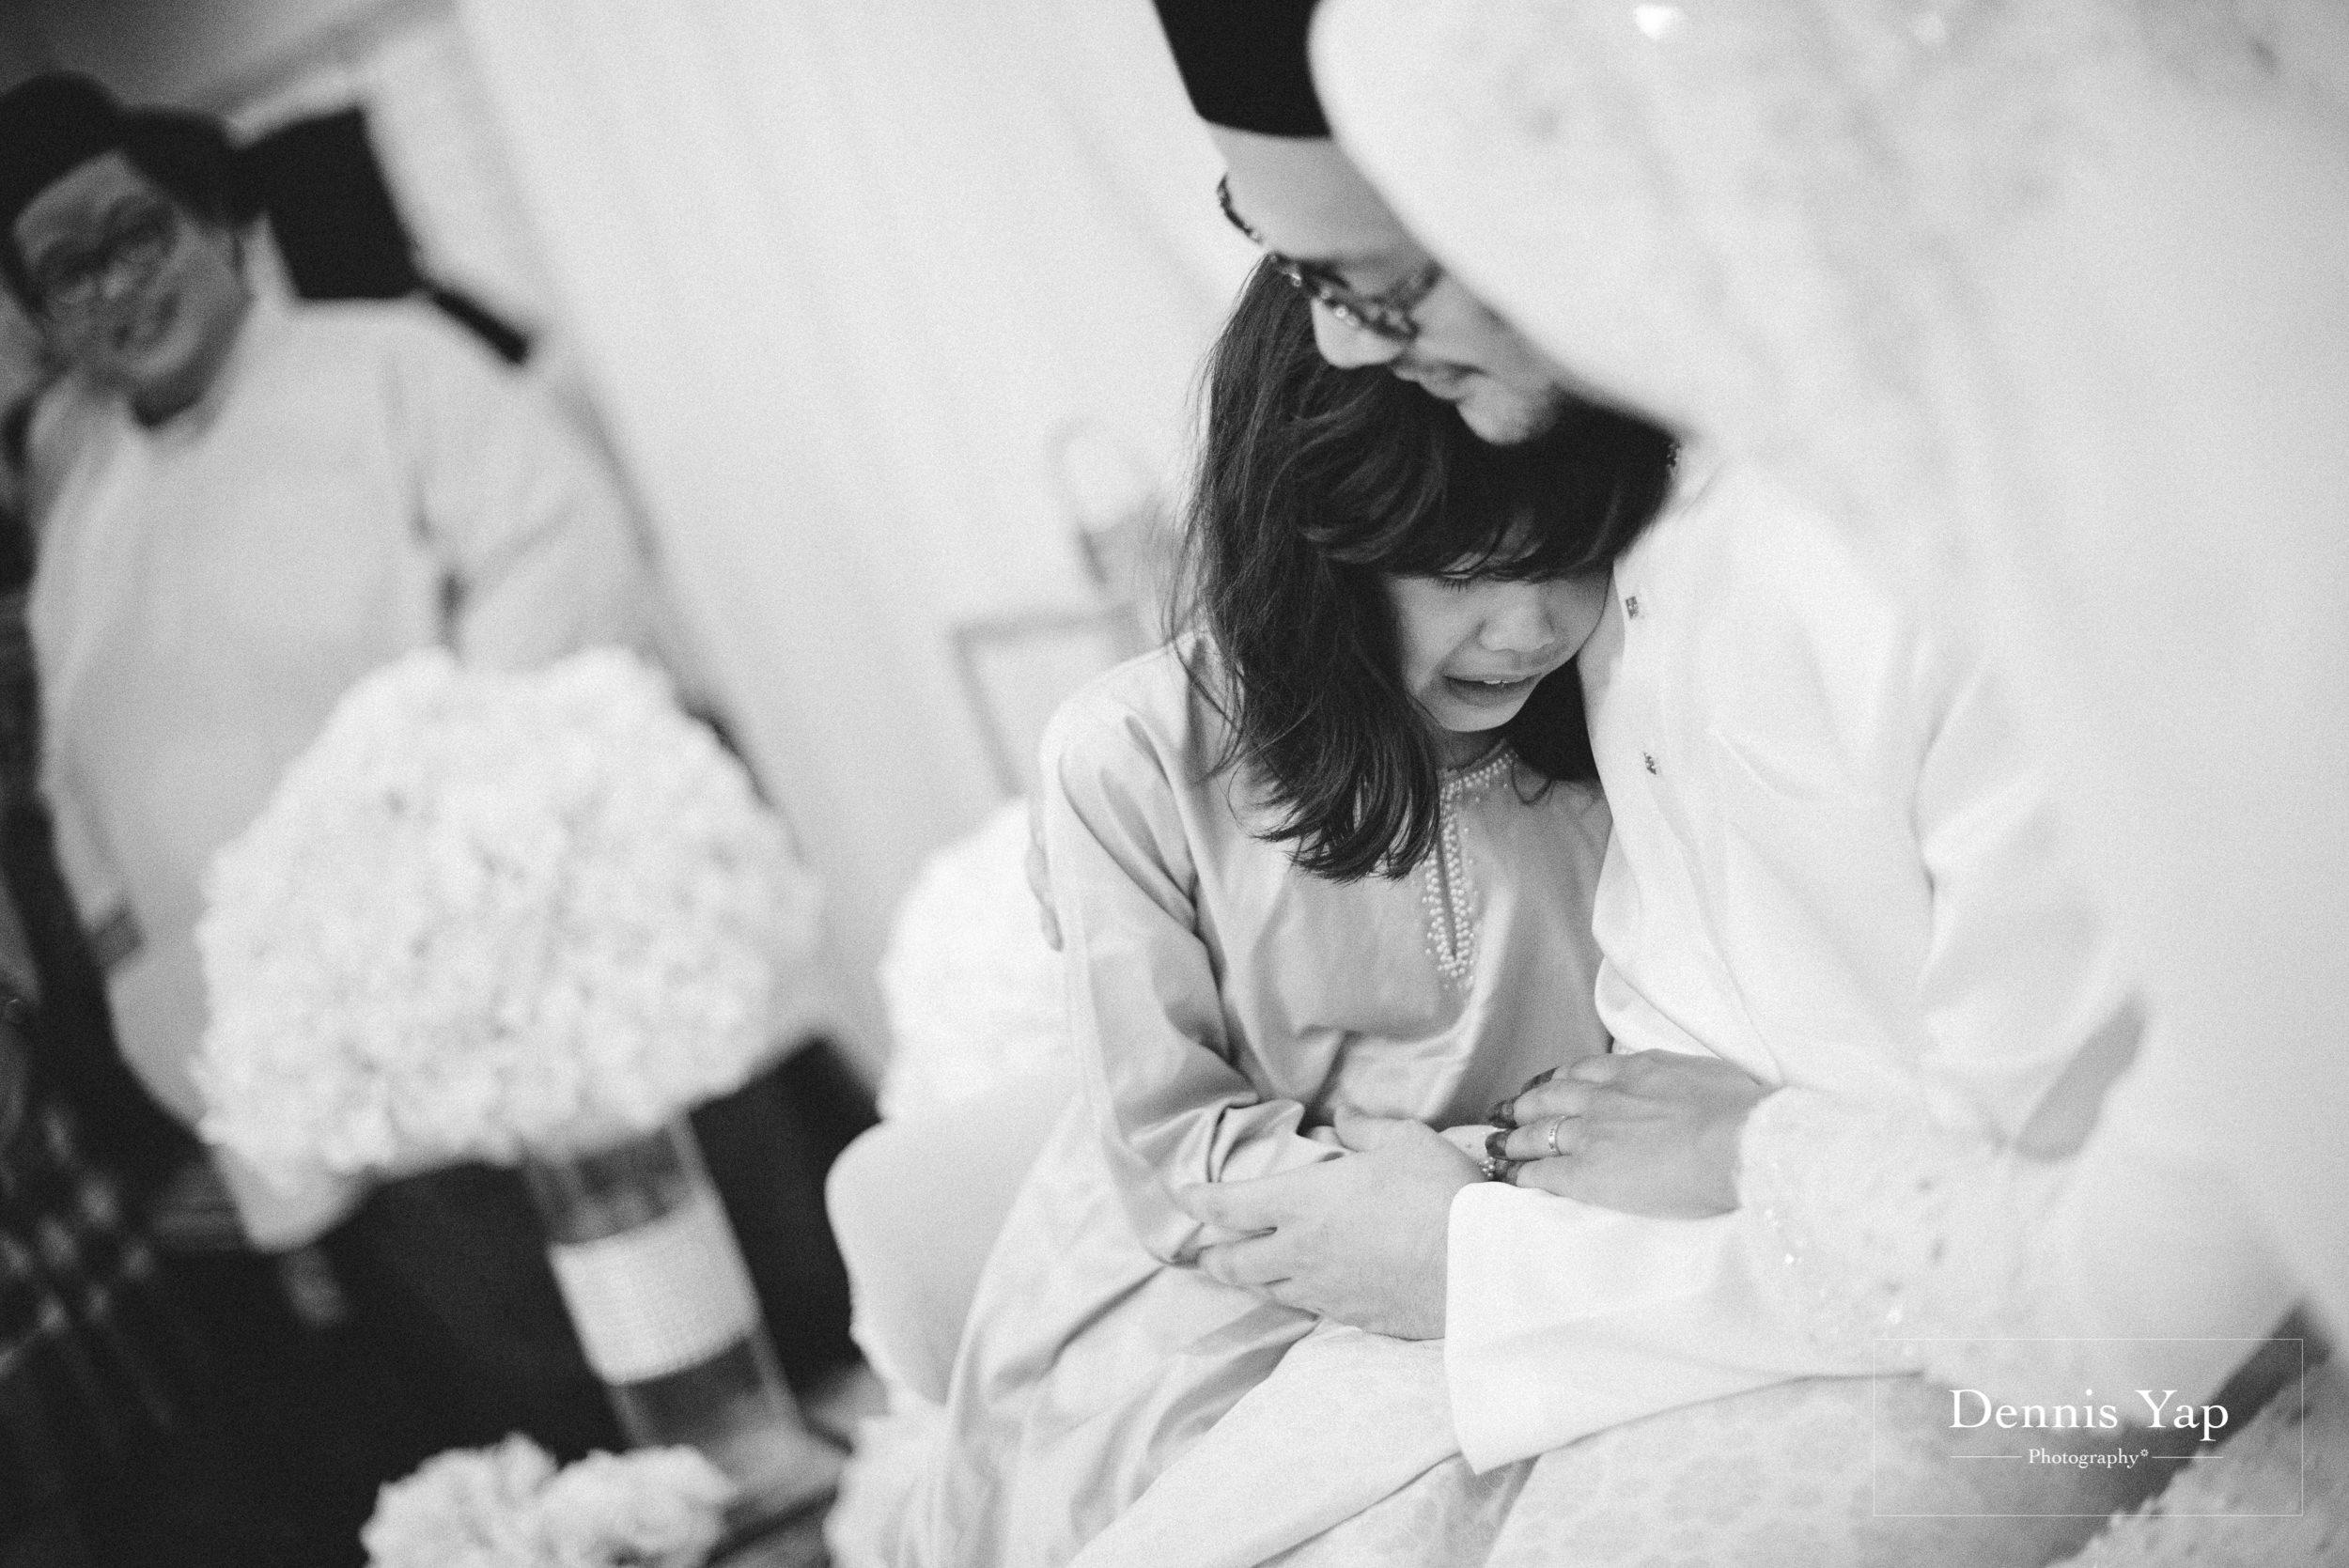 zarif hanalili malay wedding ceremony dennis yap photography-20.jpg